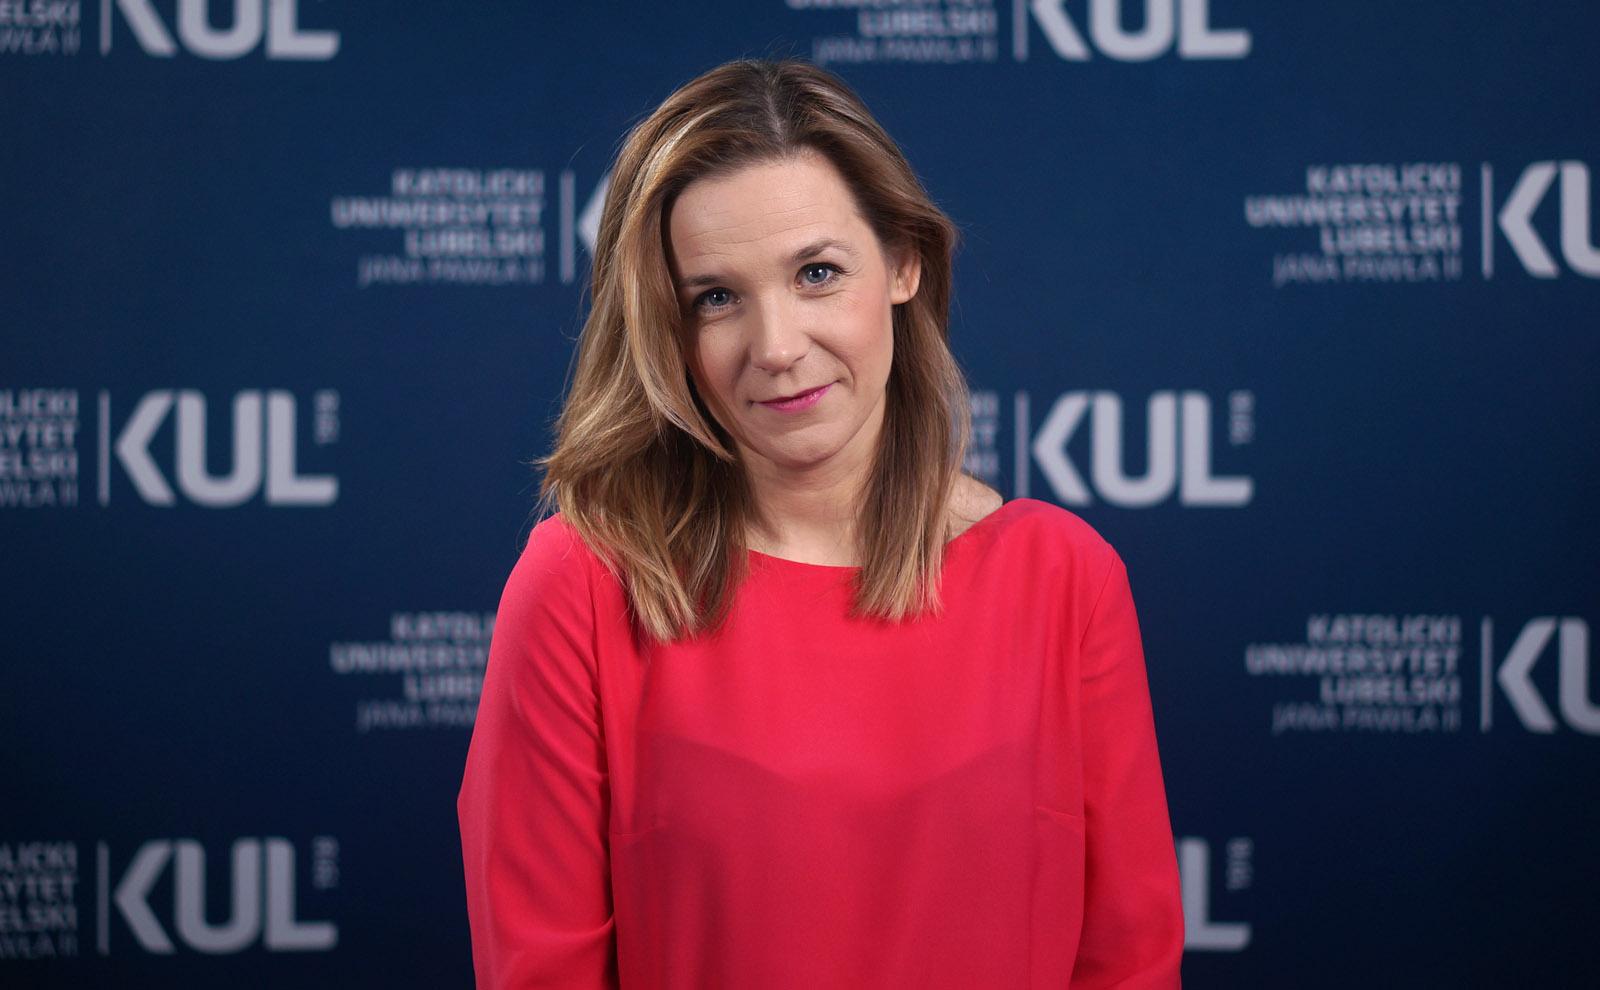 CM KUL - Joanna Sosnowska